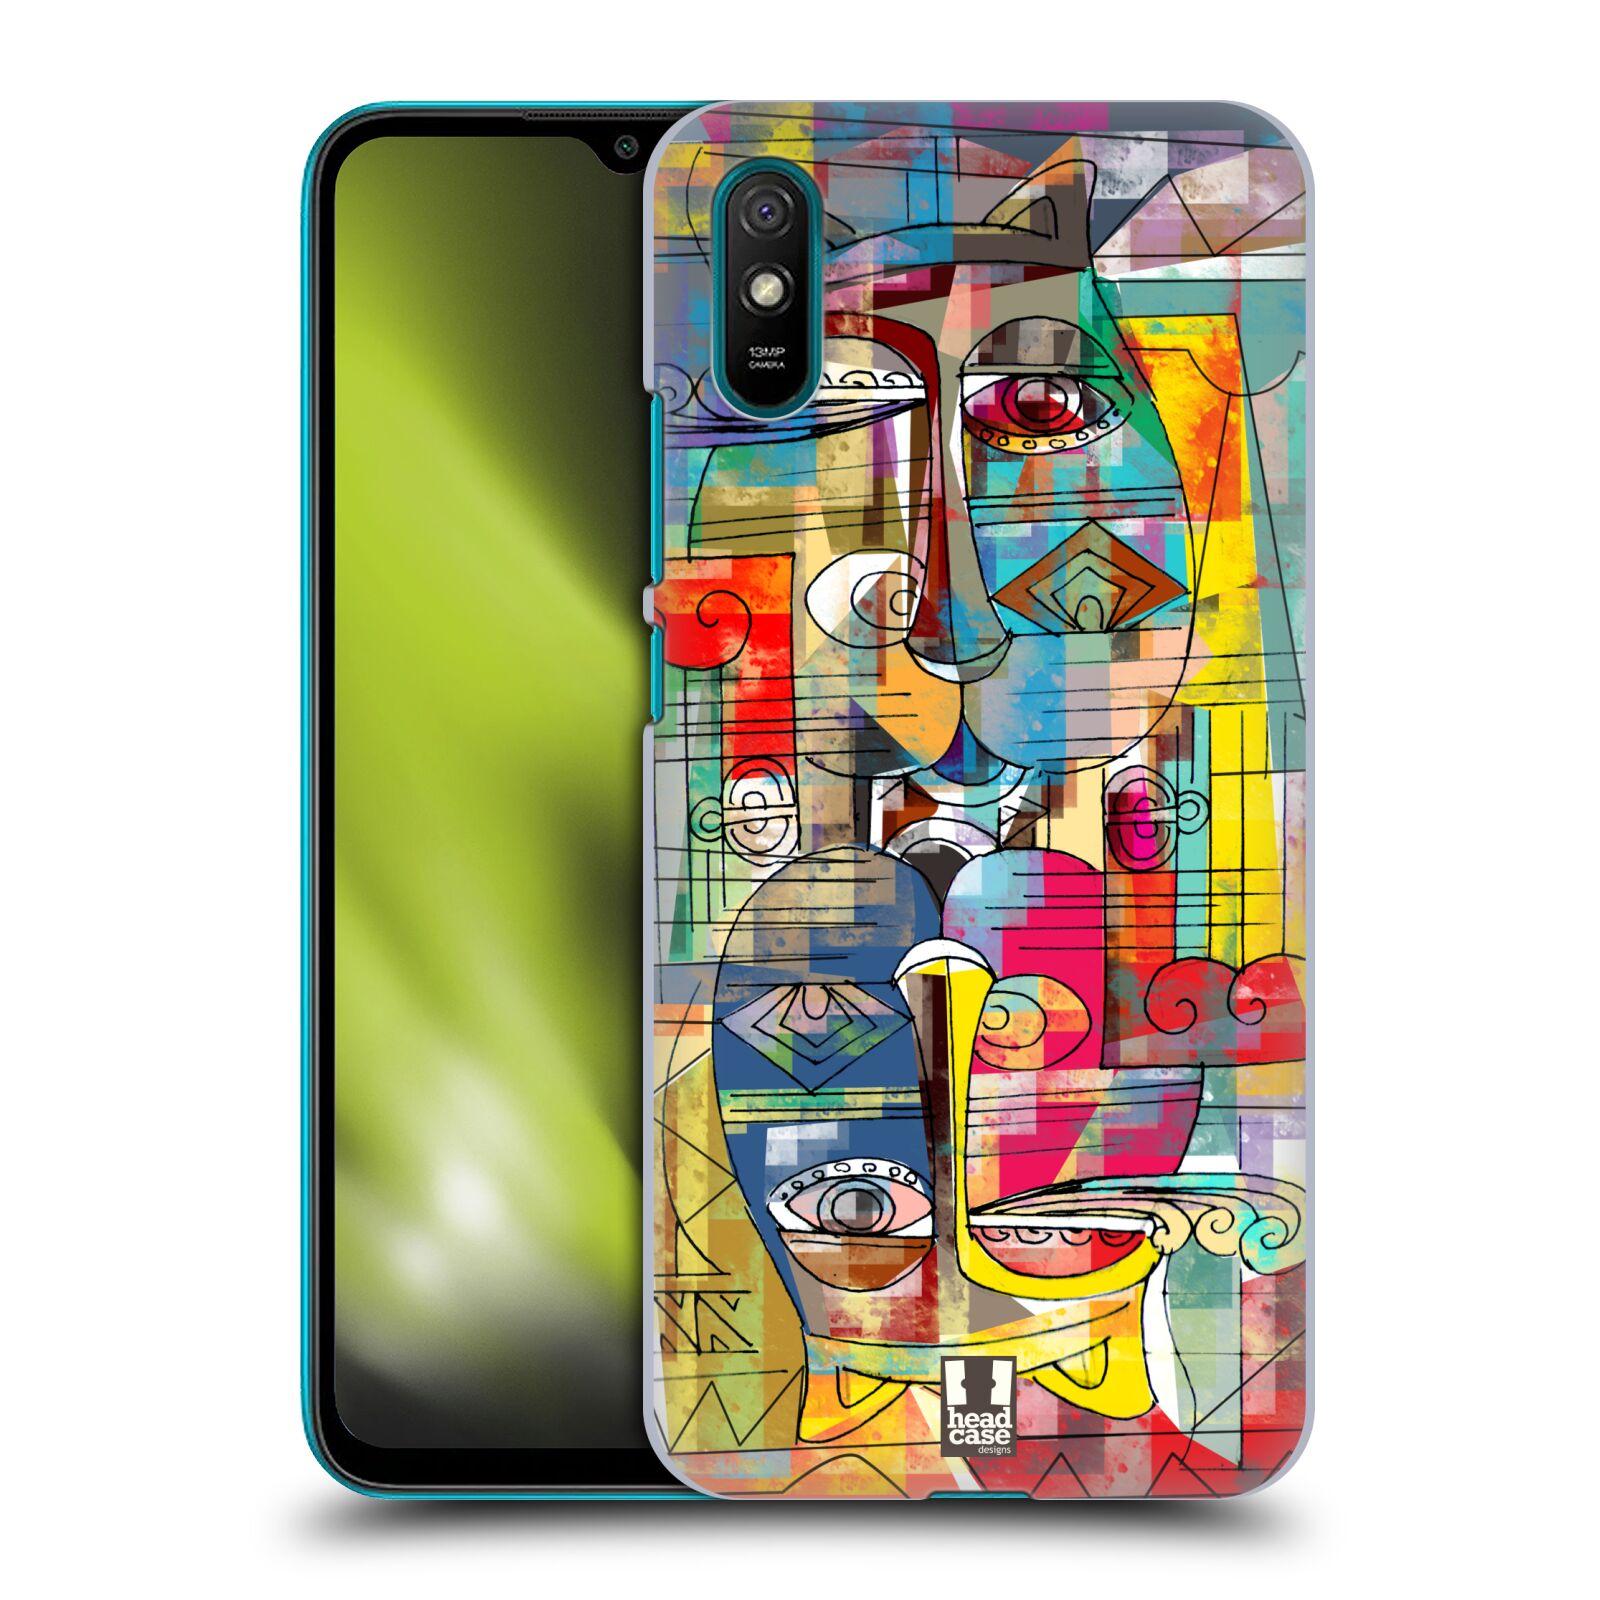 Plastové pouzdro na mobil Xiaomi Redmi 9A / Xiaomi Redmi 9AT - Head Case - AZTEC MANX